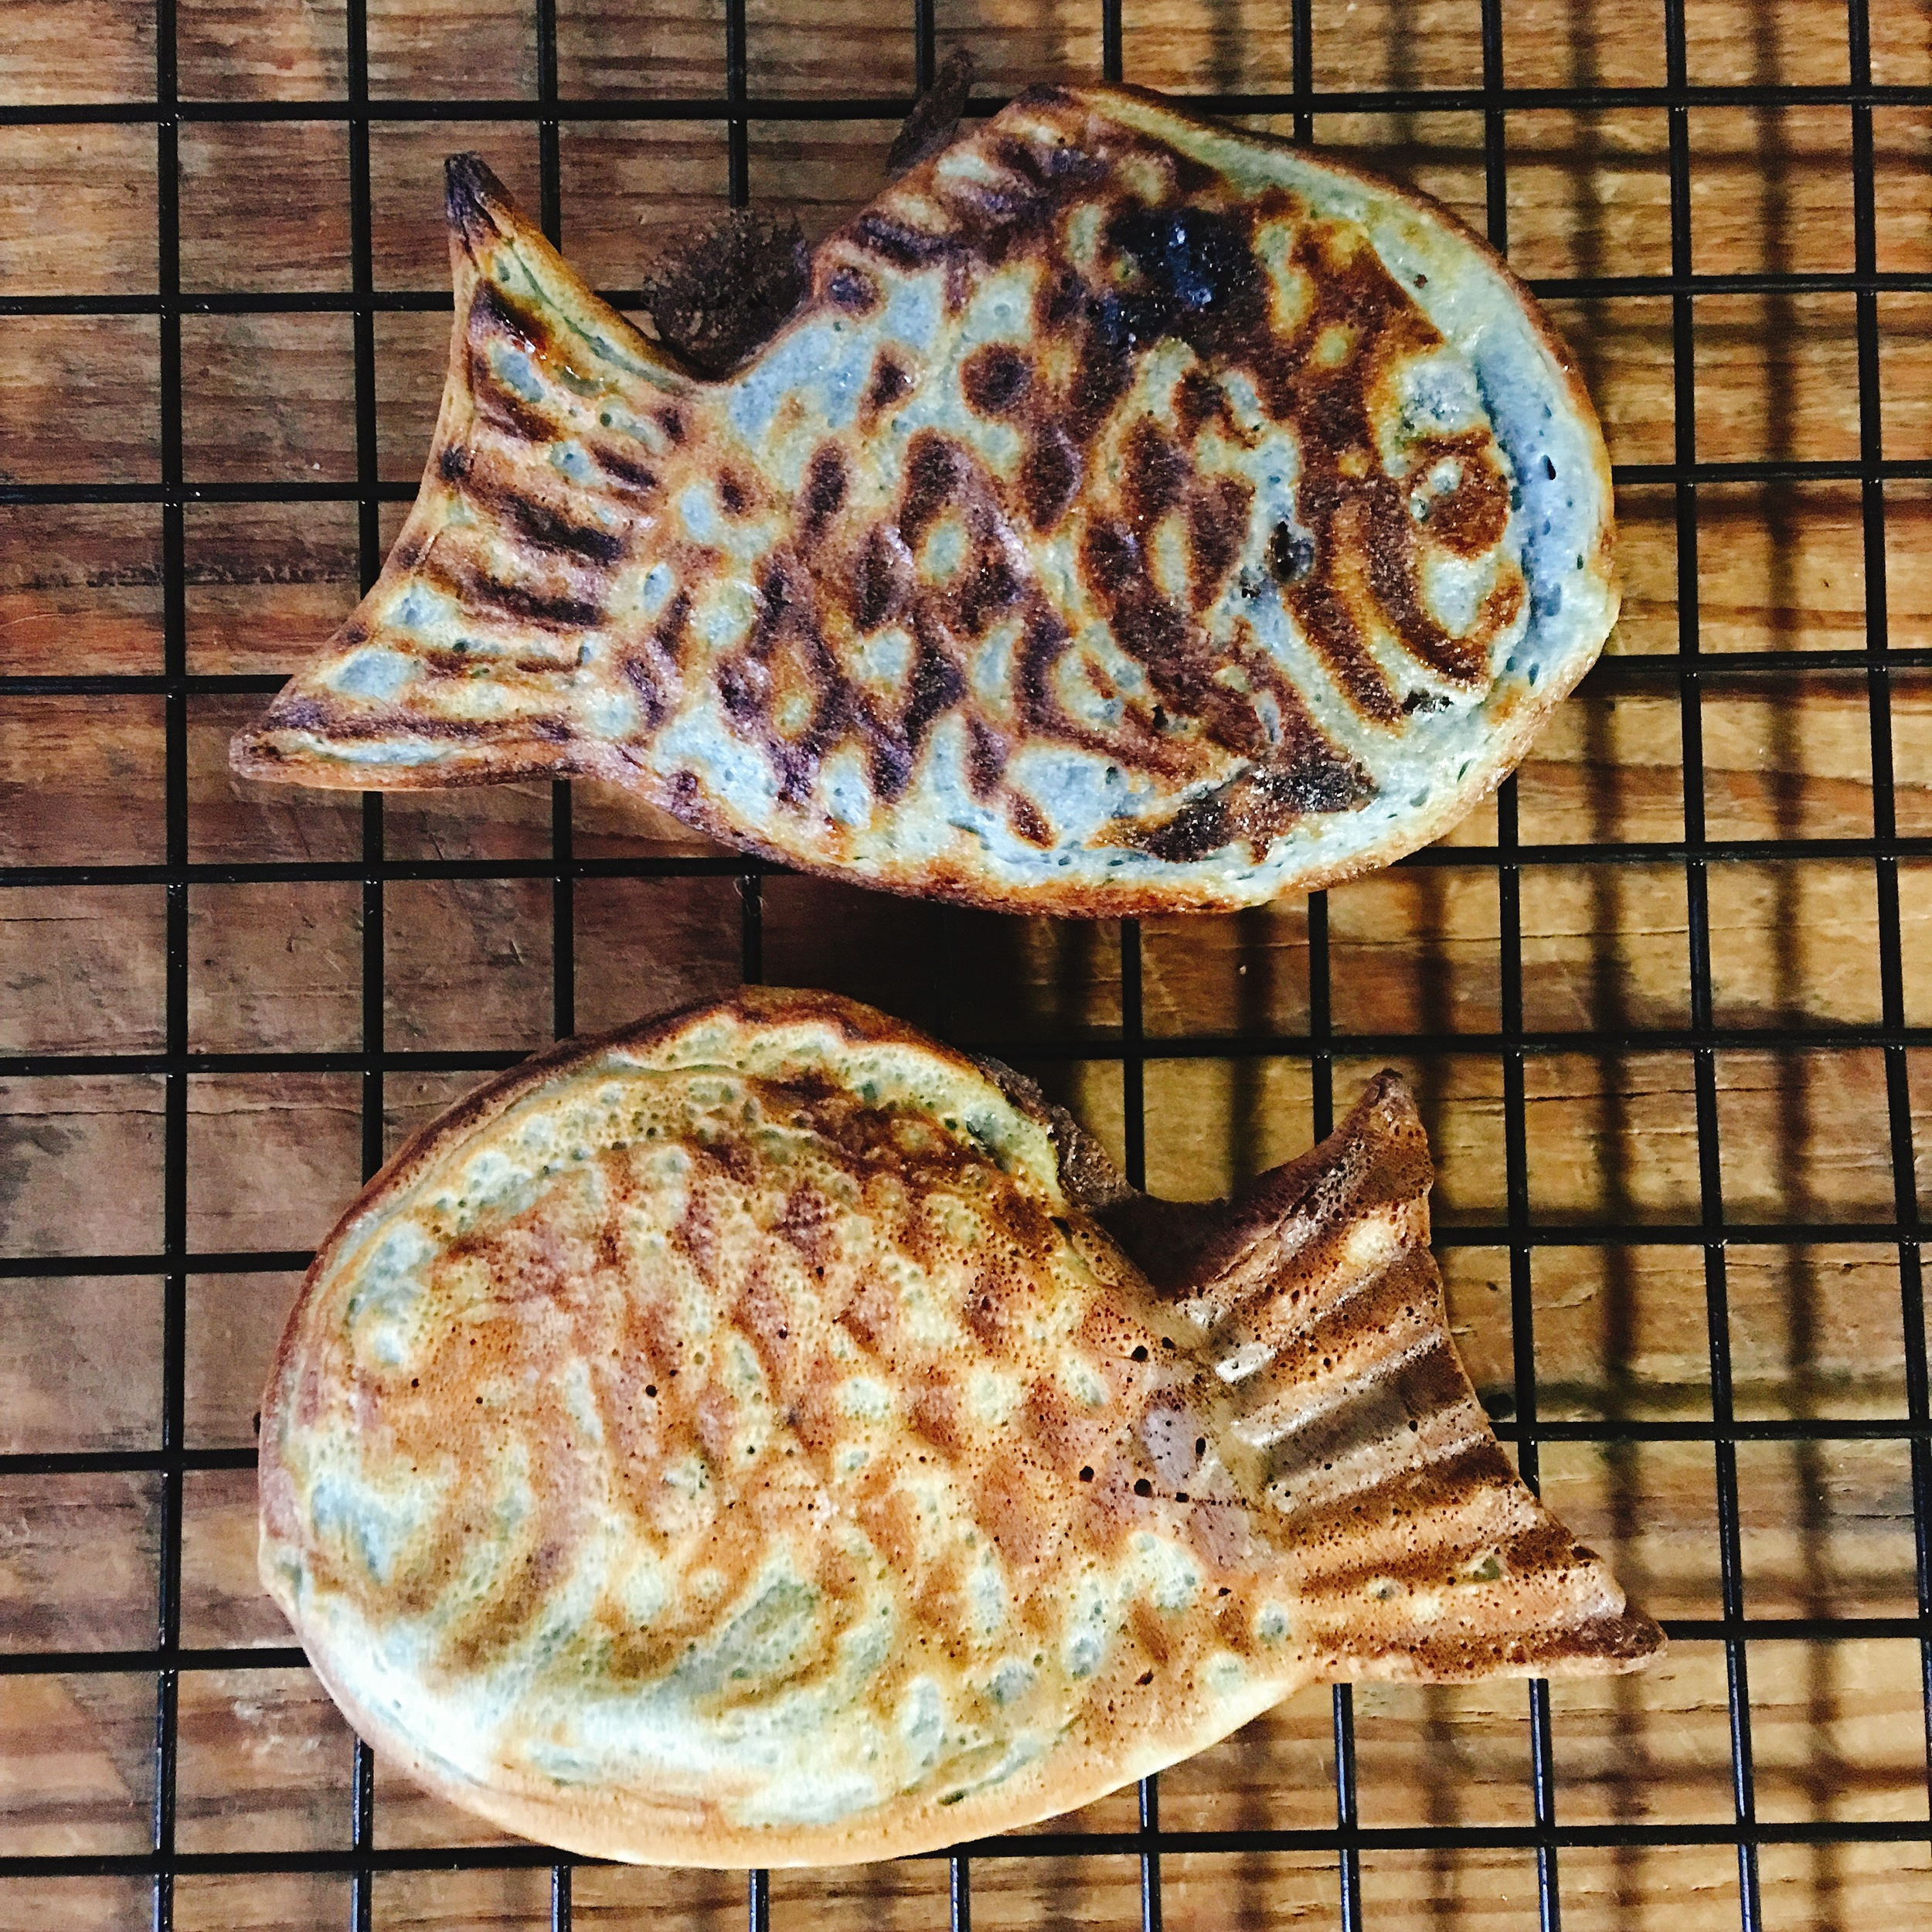 poi boong-uh-bbang (red bean stuffed waffle)